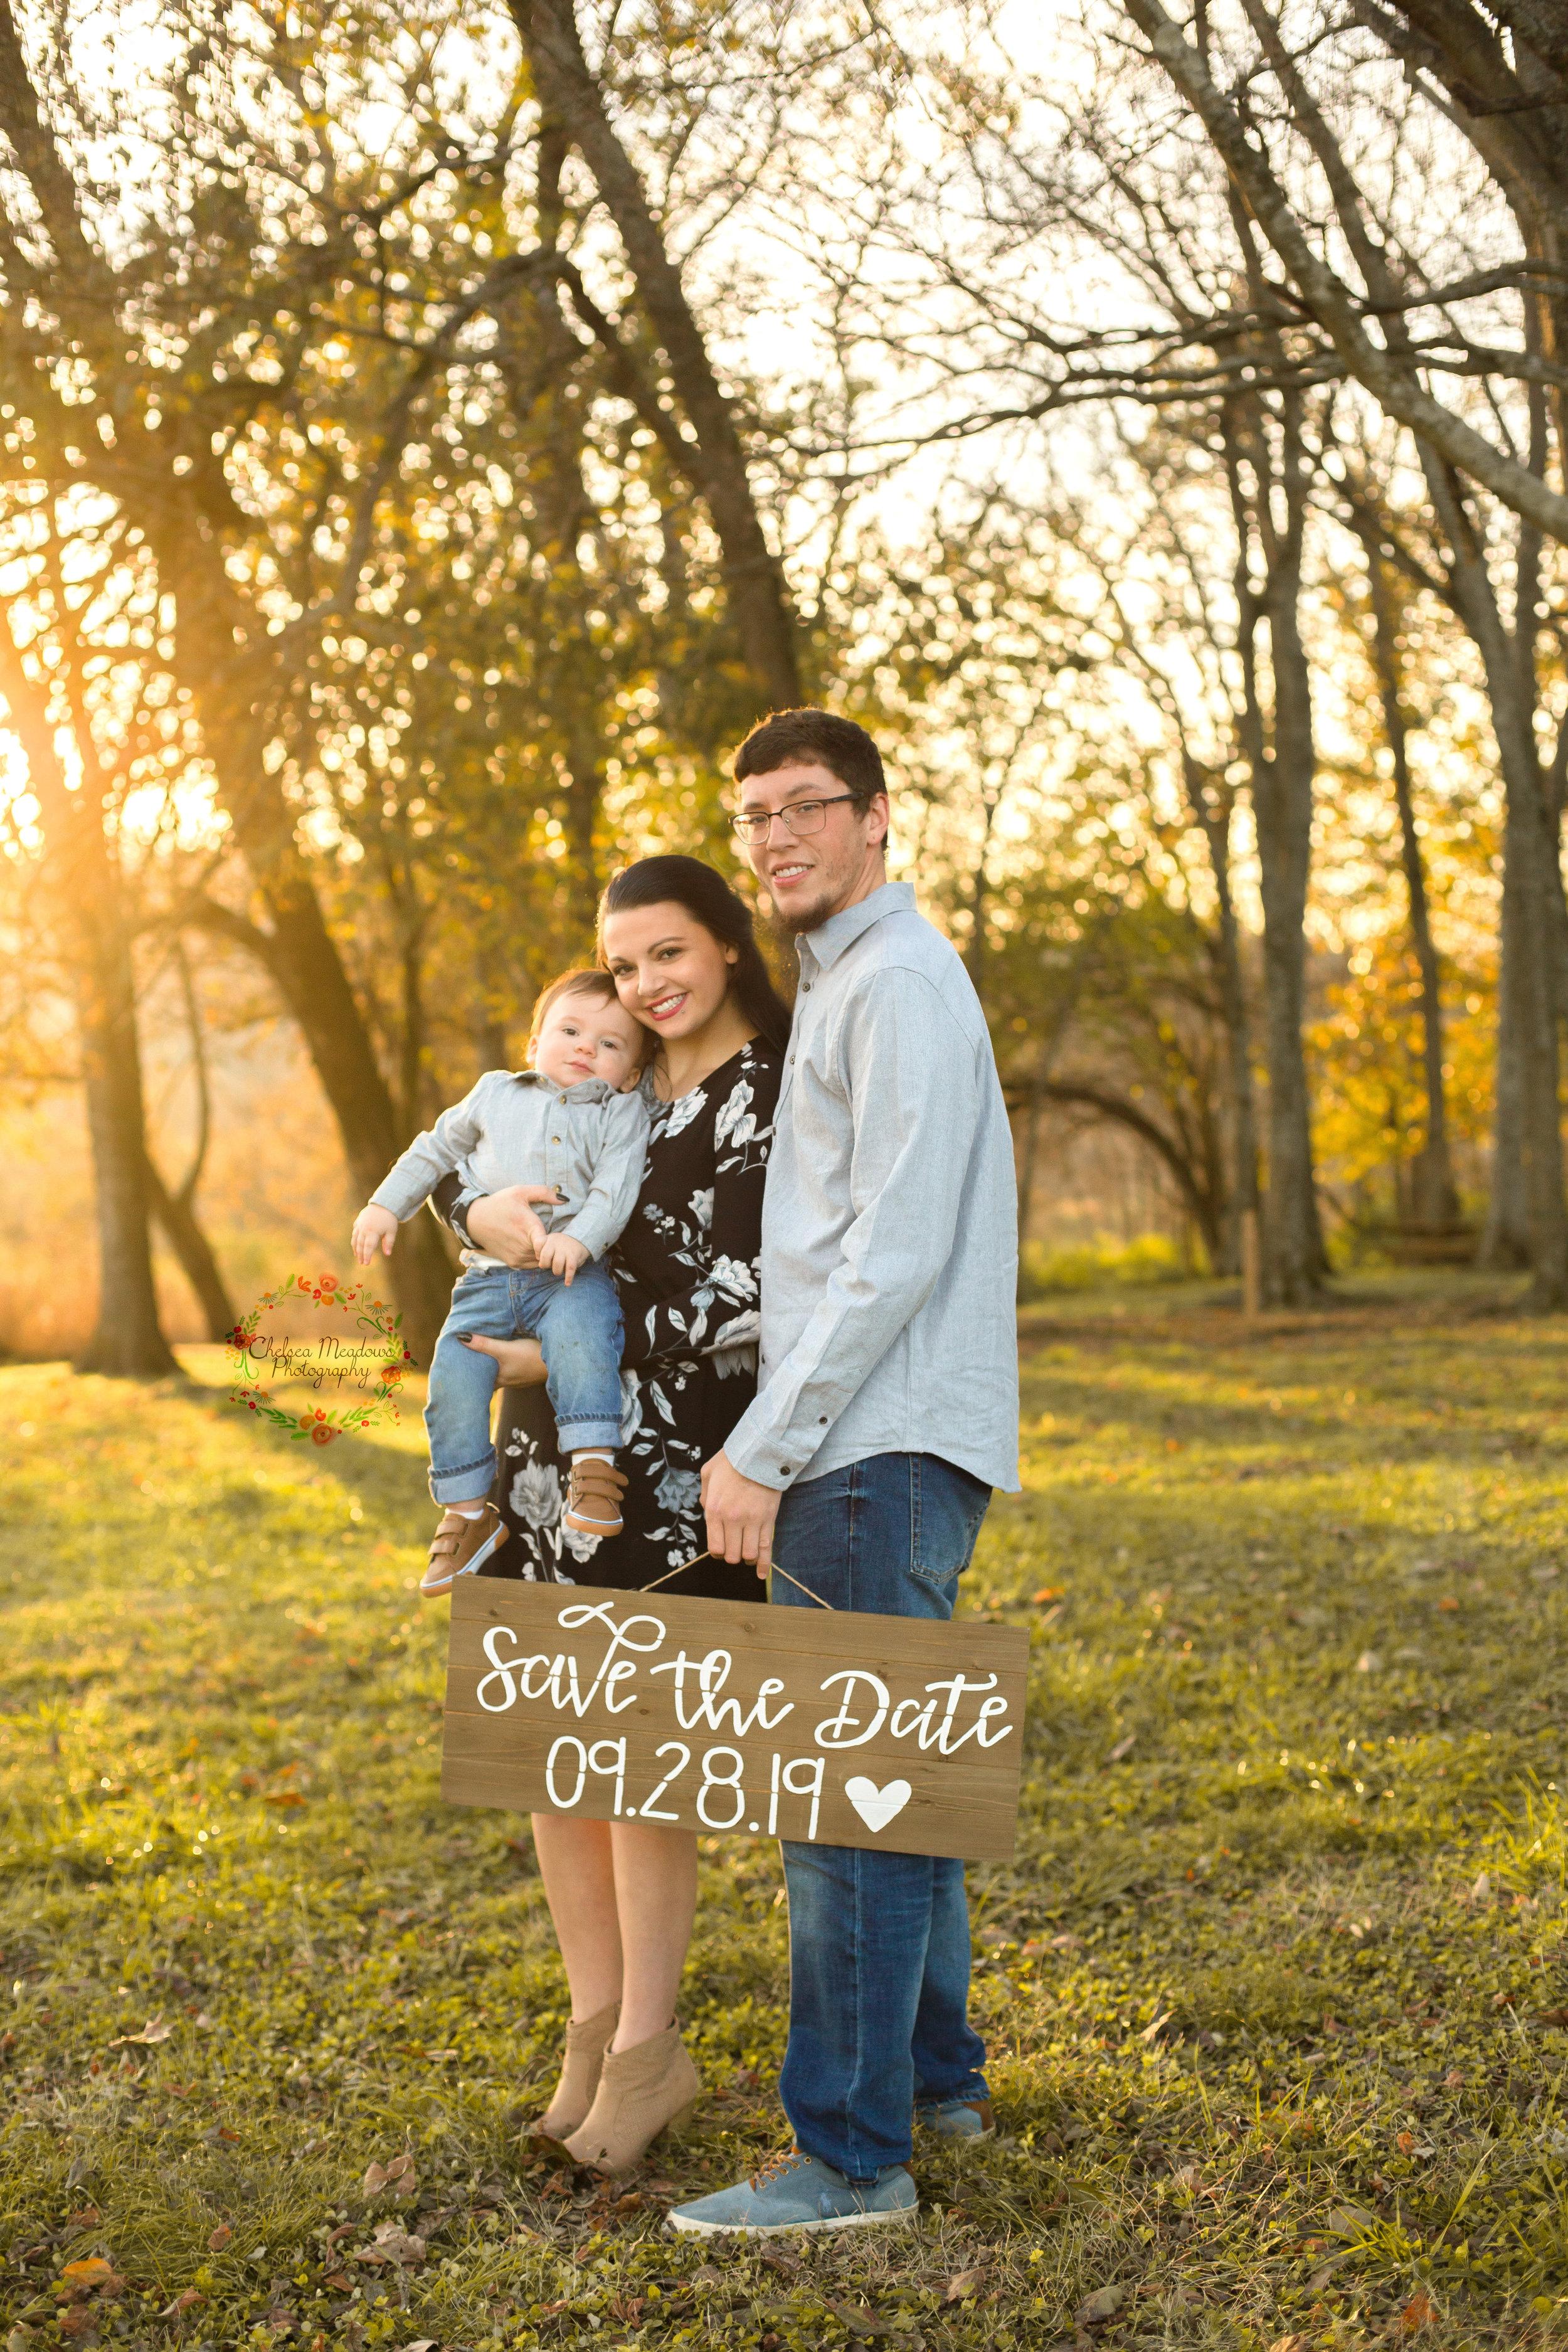 Jessica & Derek Engagement - Nashville Wedding Photographer - Chelsea Meadows Photography (31).jpg